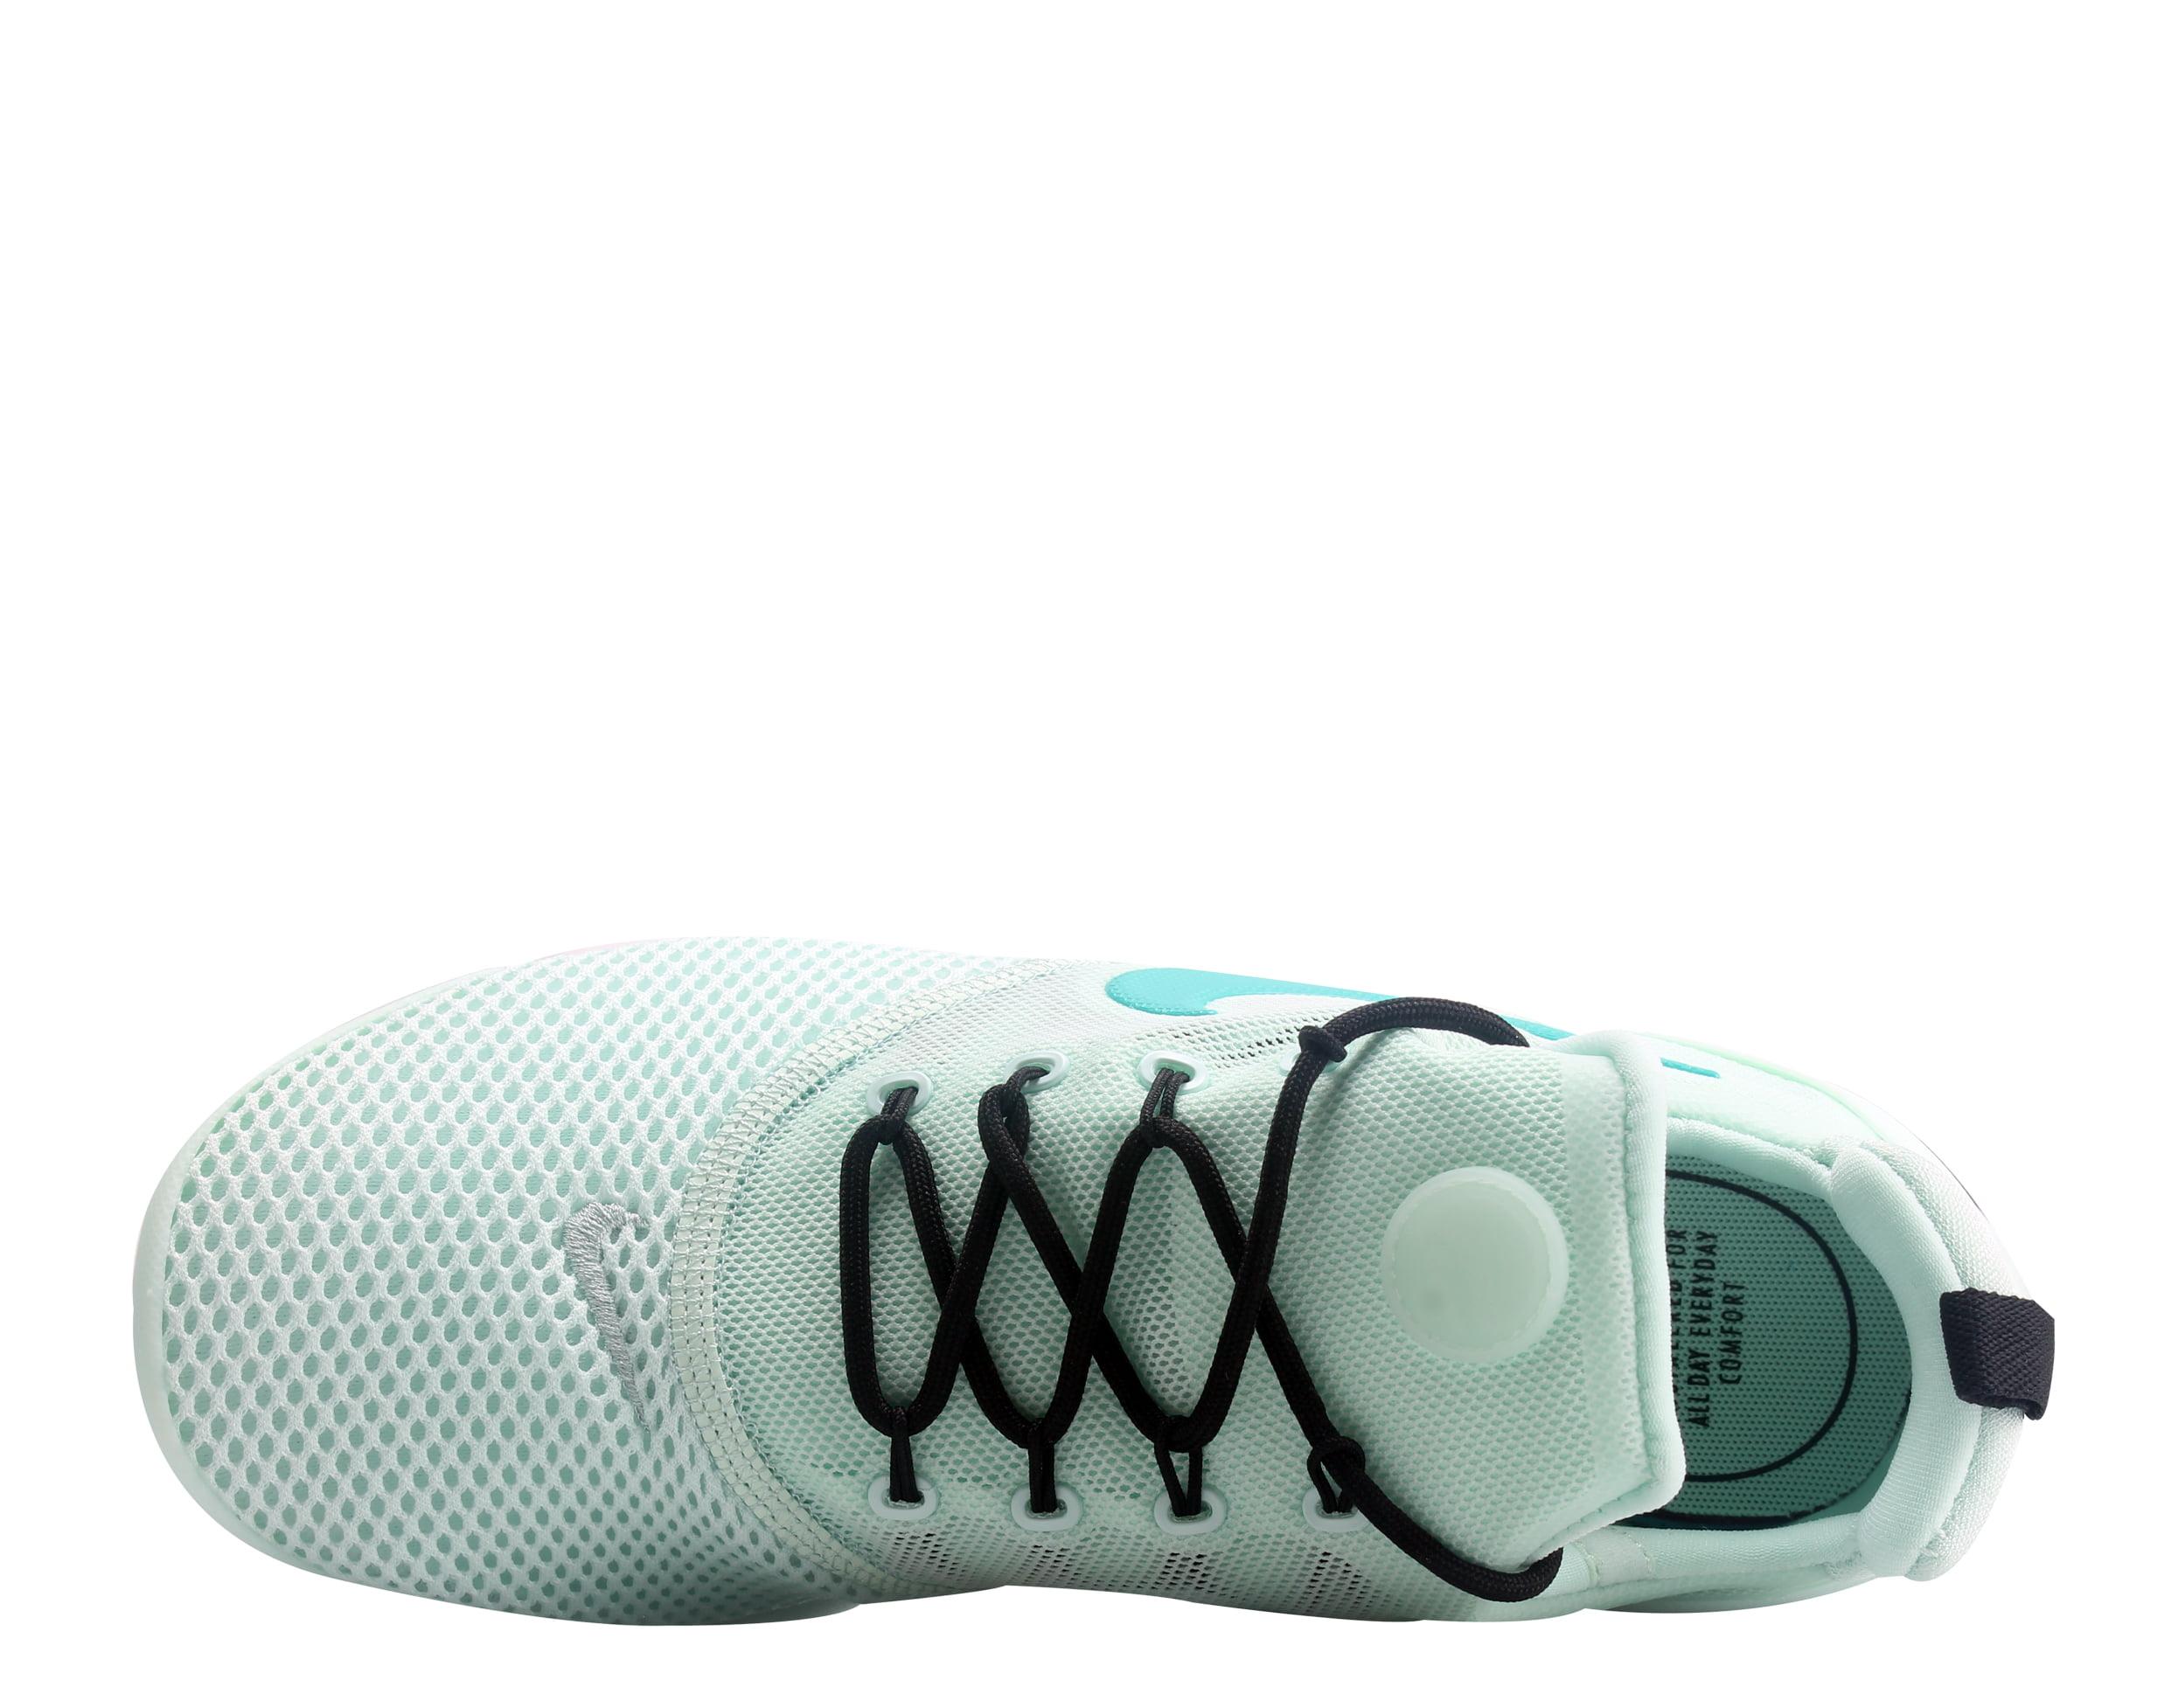 3e5a1151245b nike womens presto fly igloo clear jade black running shoe 8.5 women us -  Walmart.com